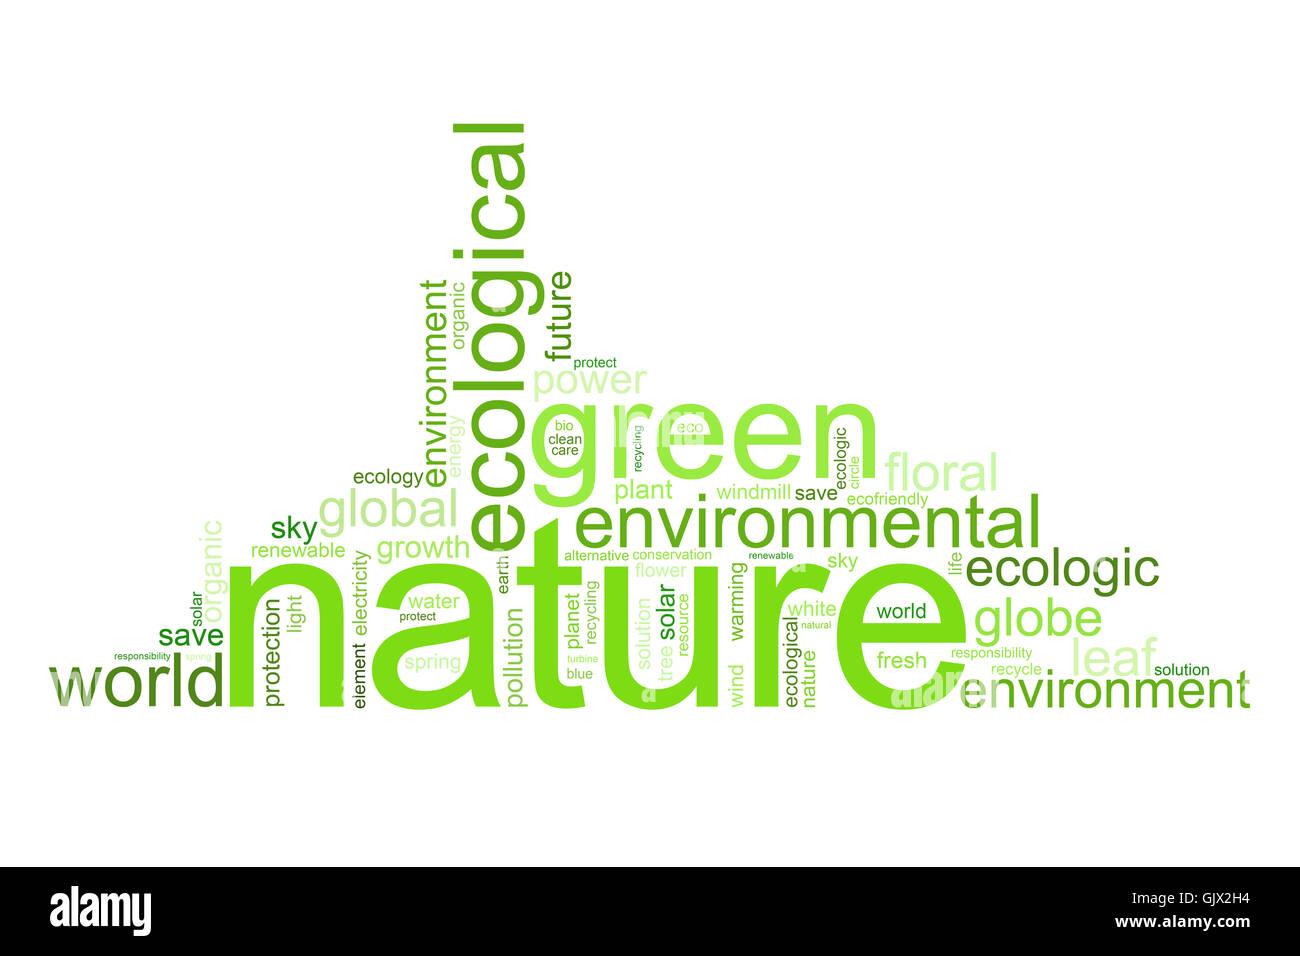 natur grun umwelt umweltschutz erde zukunft okologie naturschutz natur grun umwelt umweltschutz erde zukunft okologie - Stock Image